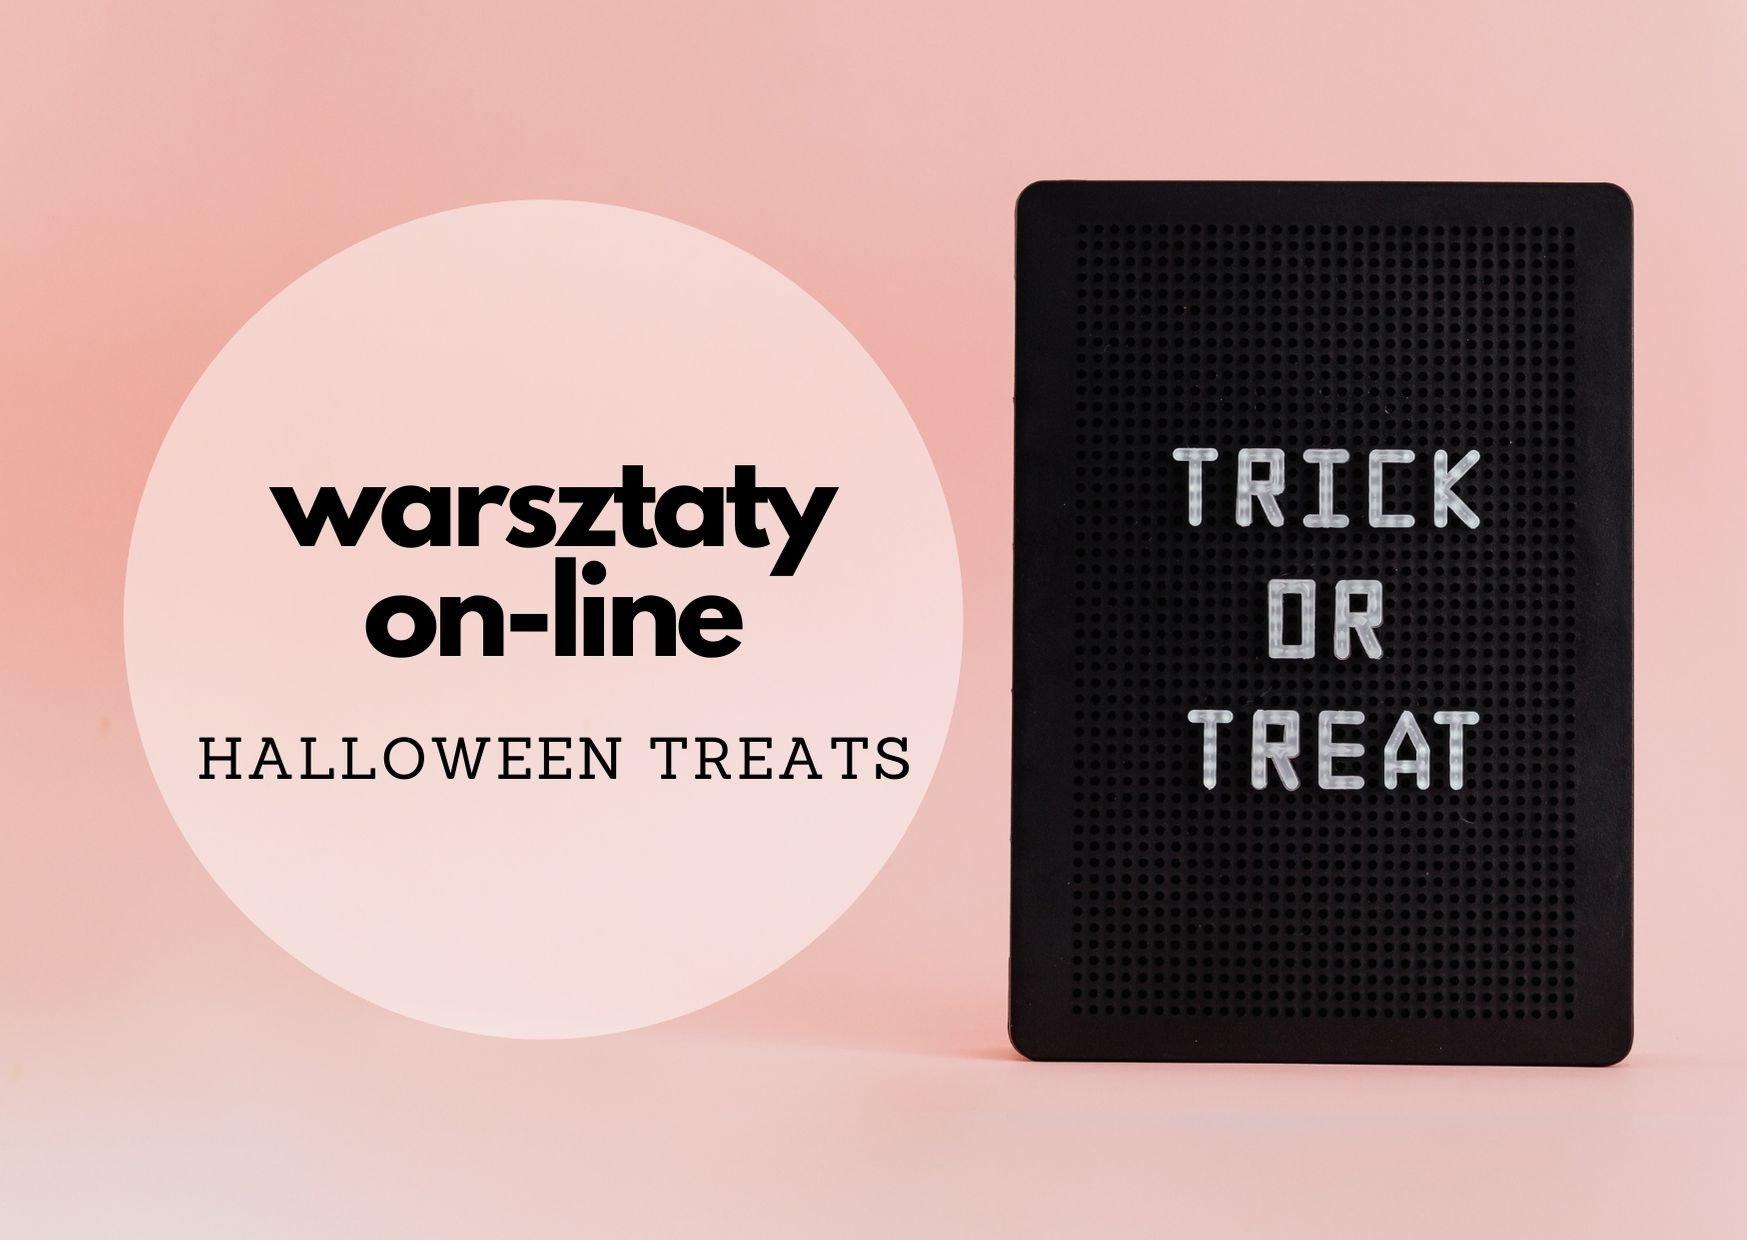 Warsztaty kulinarne on-line: Halloween treats